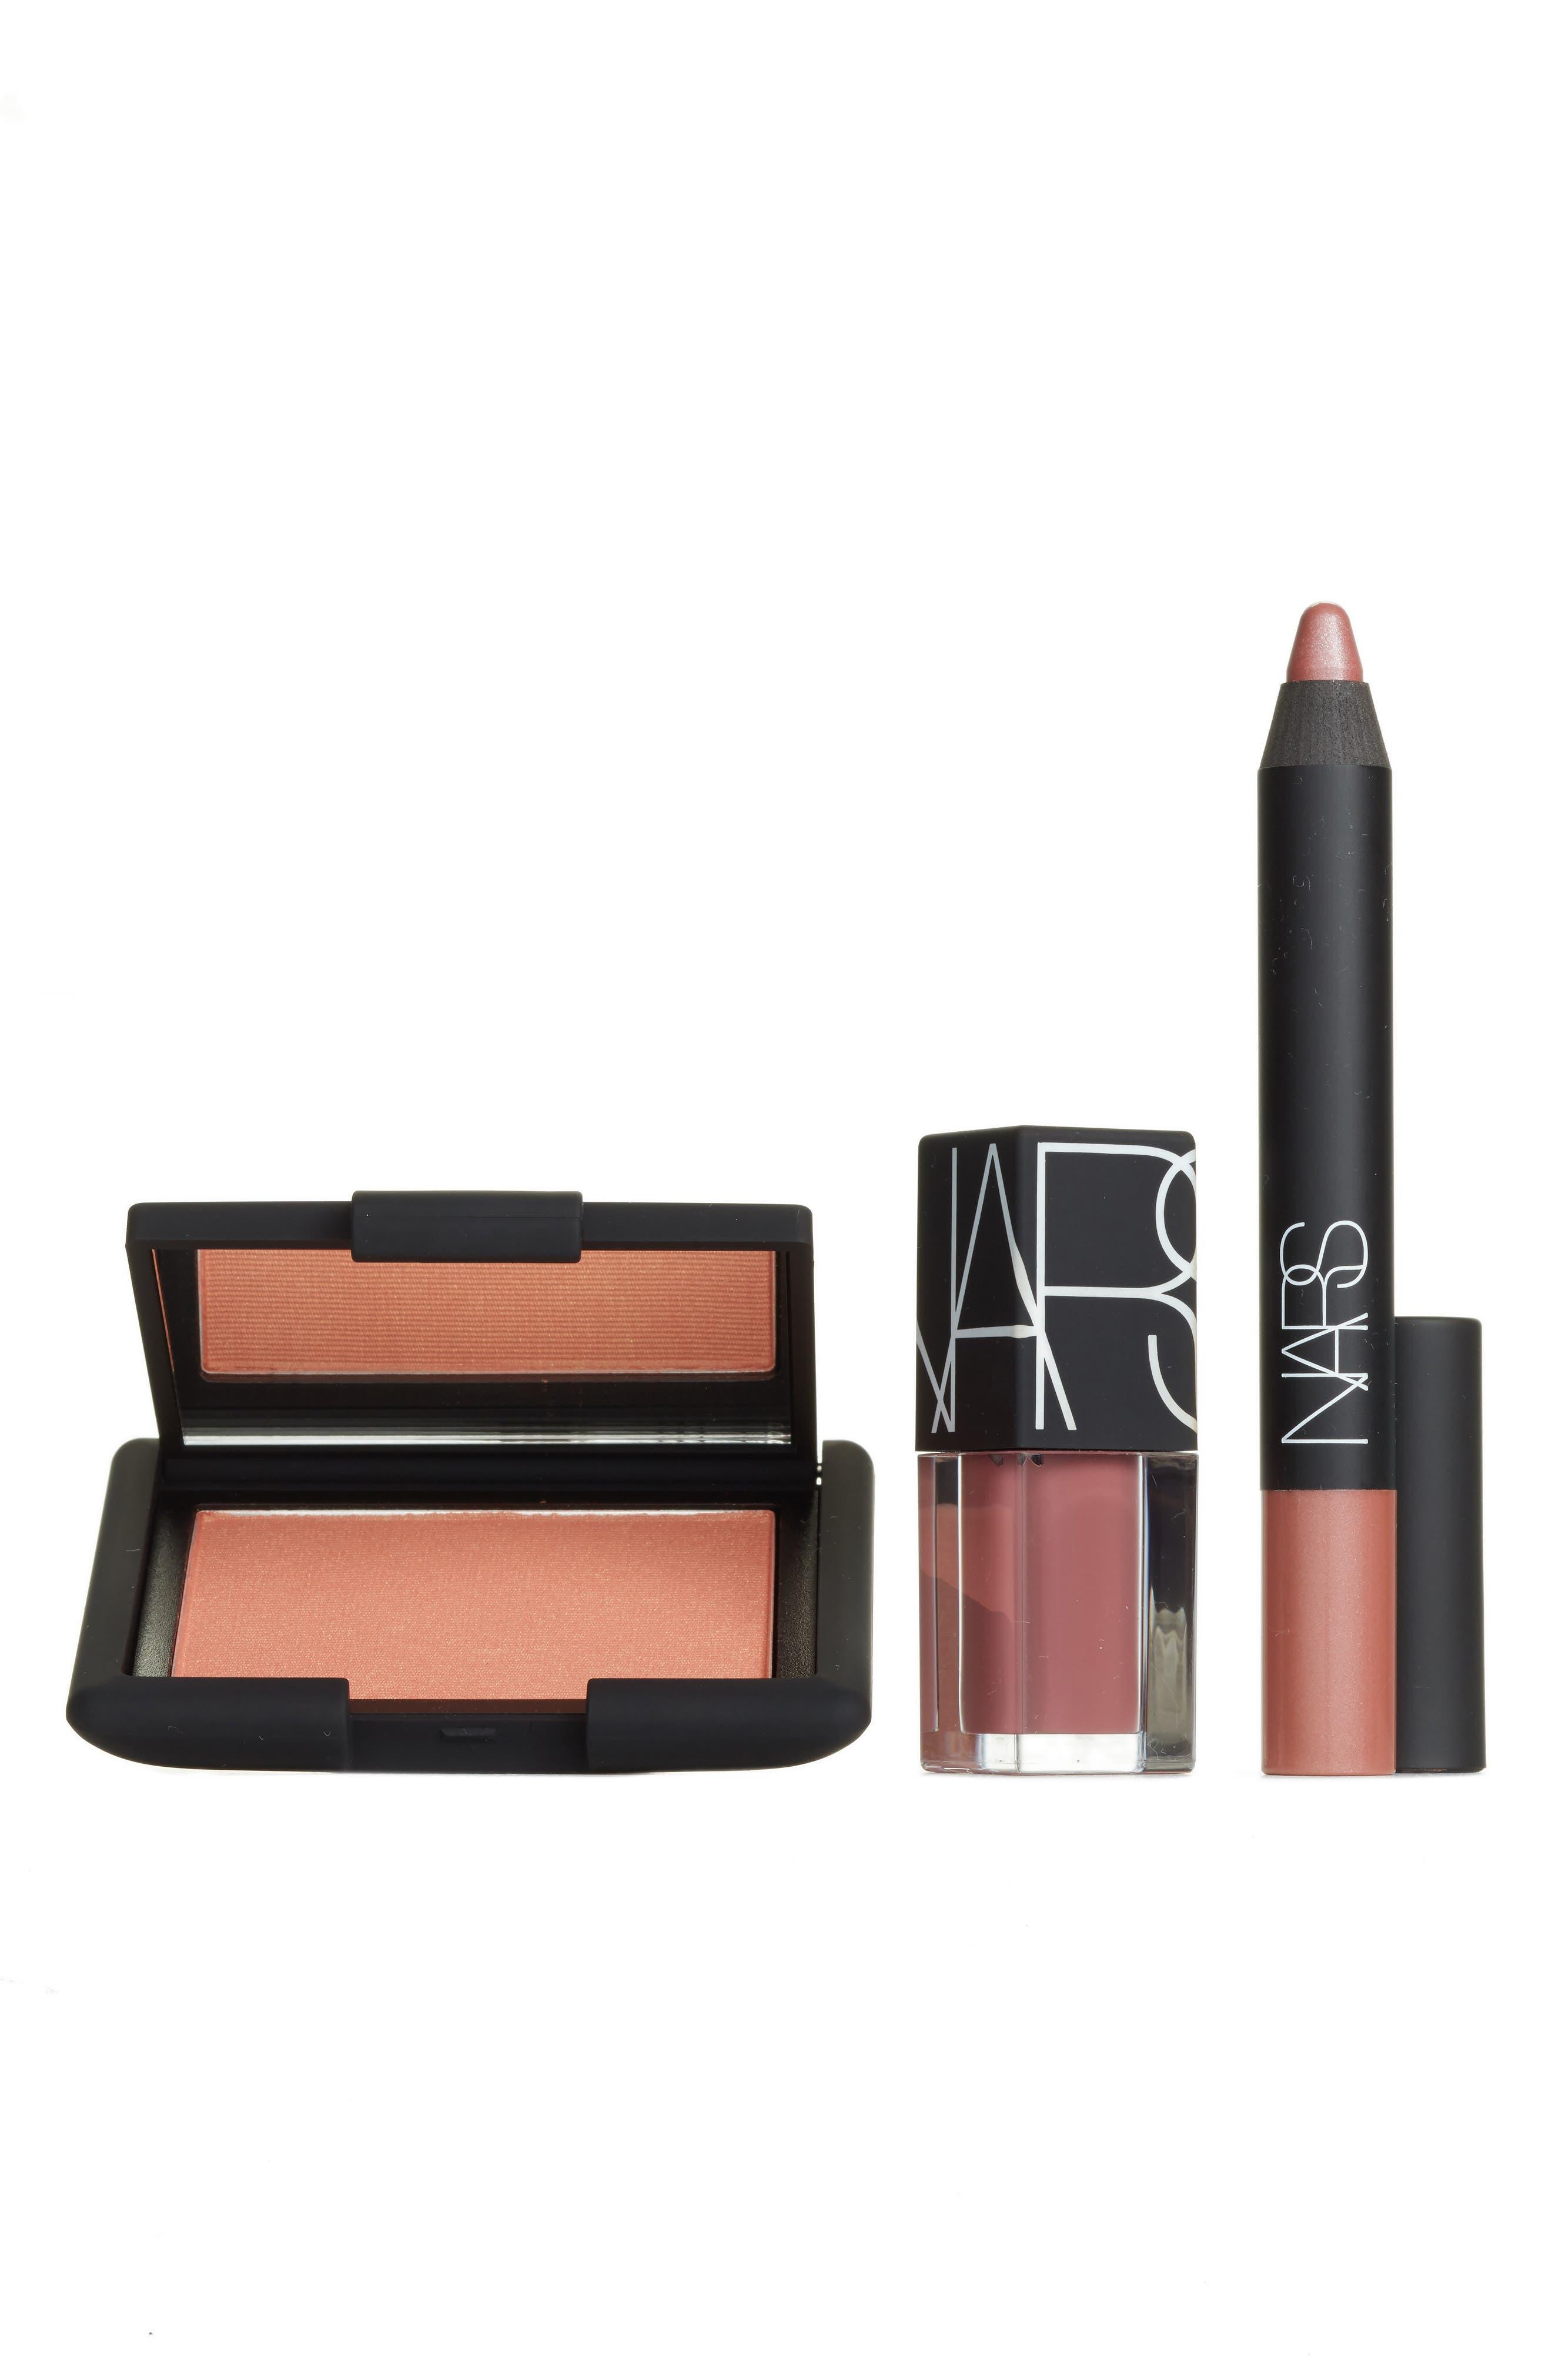 NARS Nude Lip & Cheek Trio (Nordstrom Online Exclusive) ($66 Value)